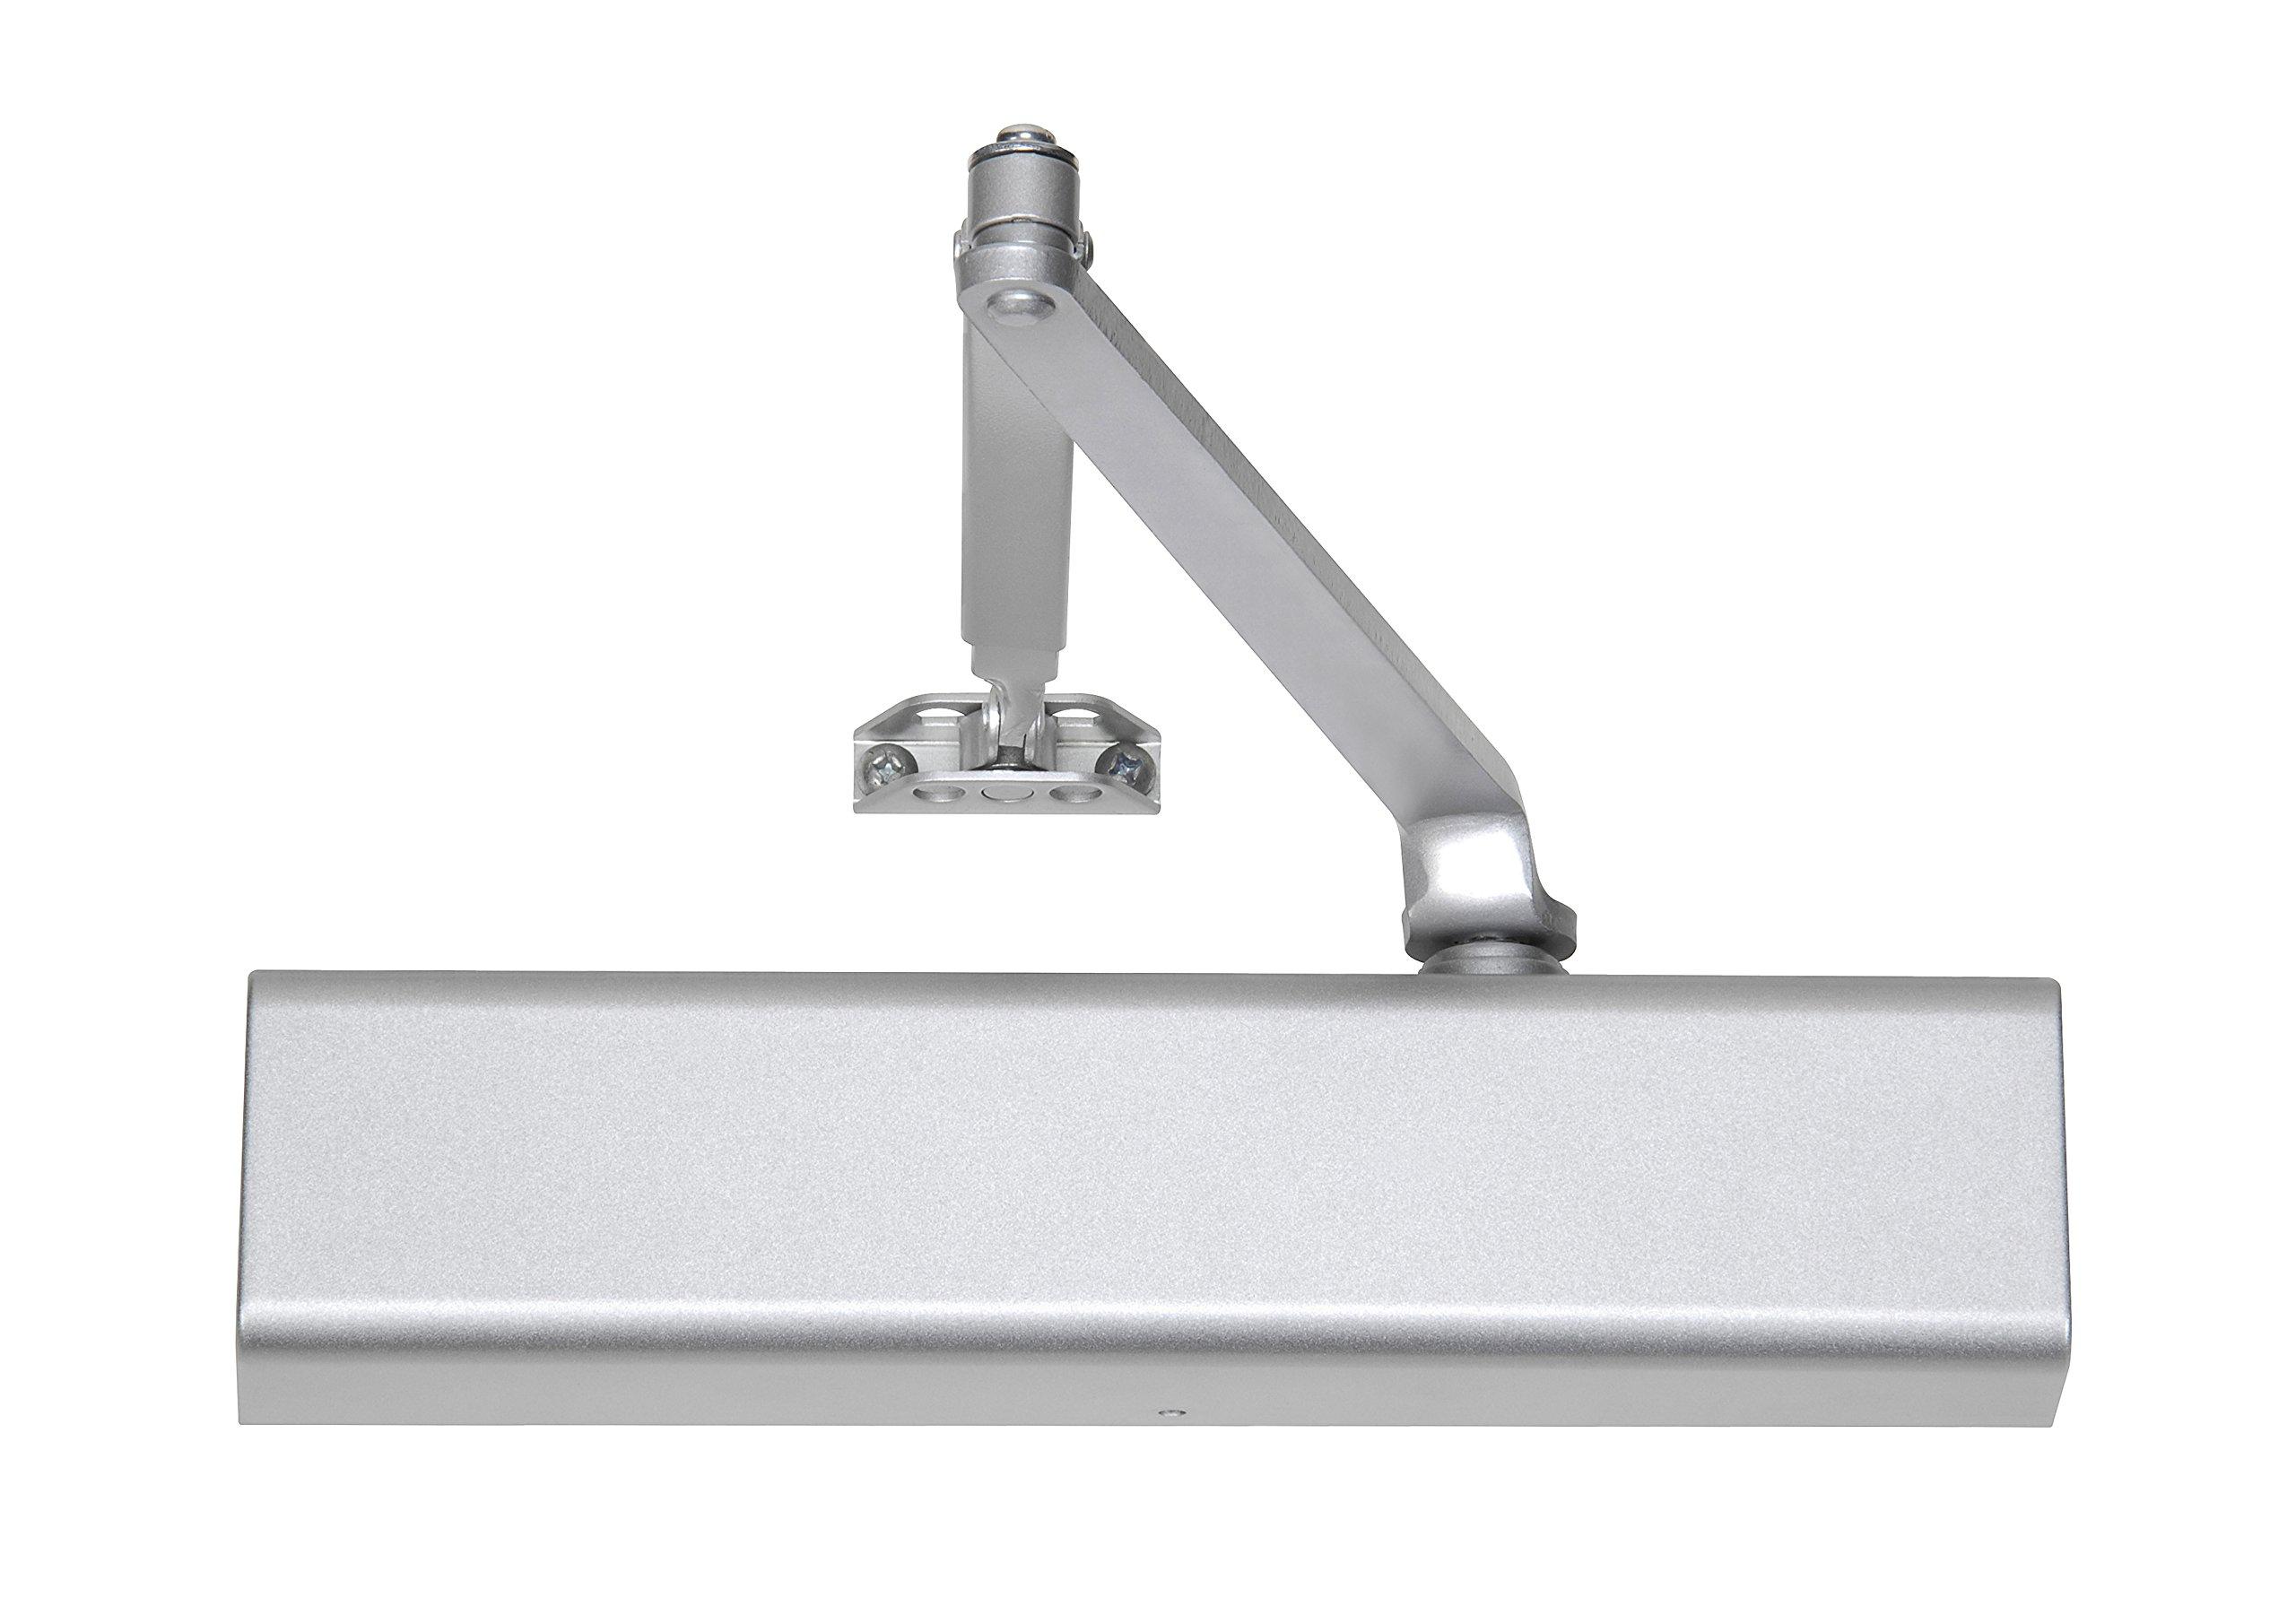 Norton Door Controls 210 x 689 210 Series Door Closer, Cast Aluminum Body, Adjustable Size 1-6, Aluminum Finish